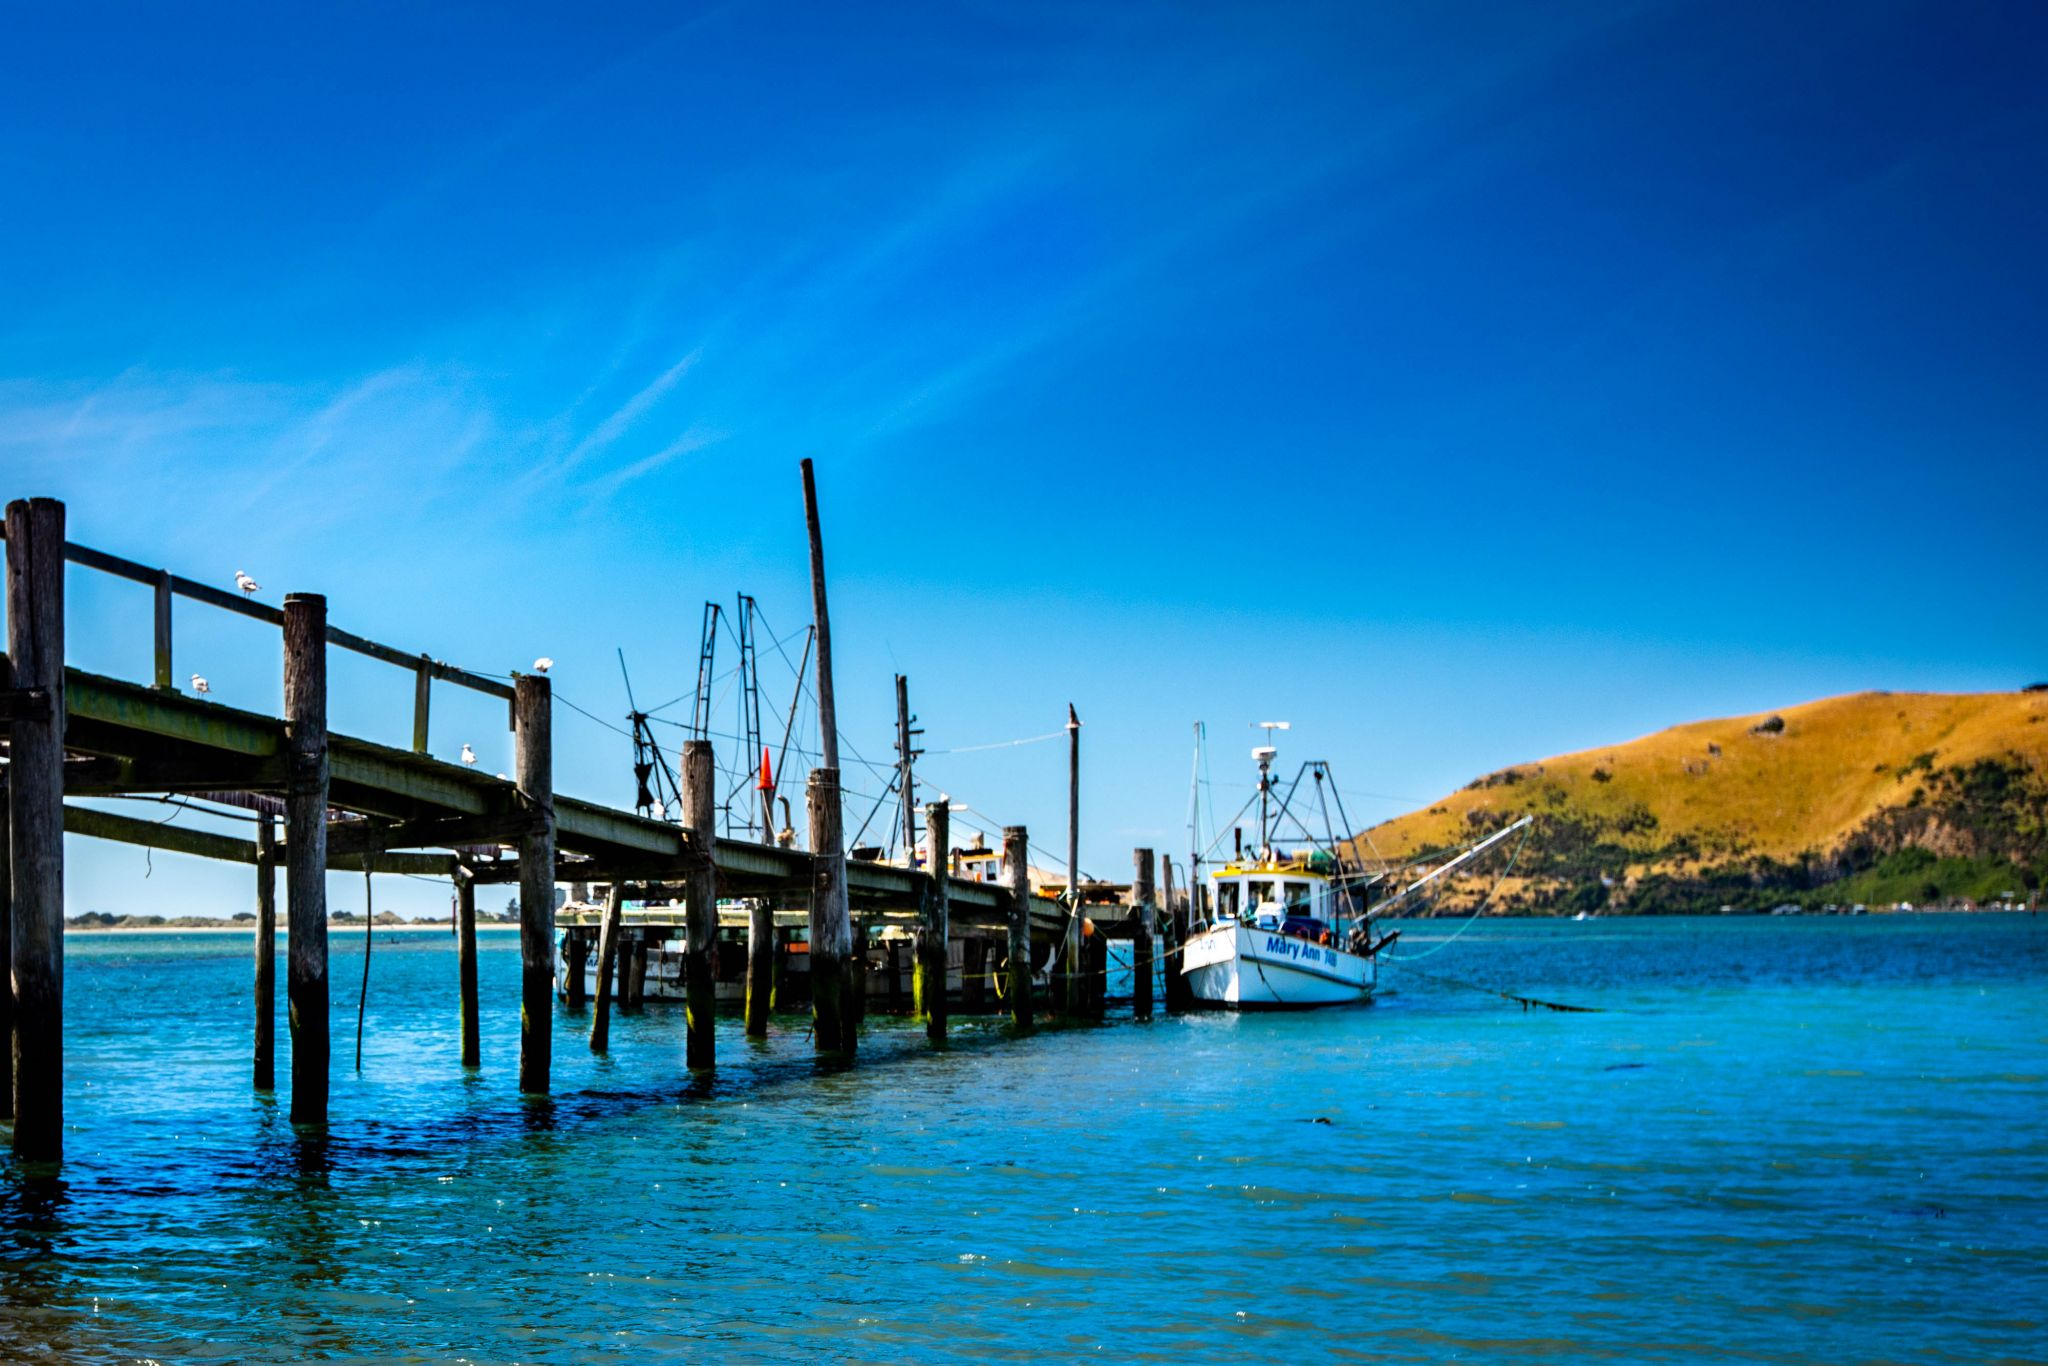 Jetty & fishing boat, Otakou, South Island, New Zealand